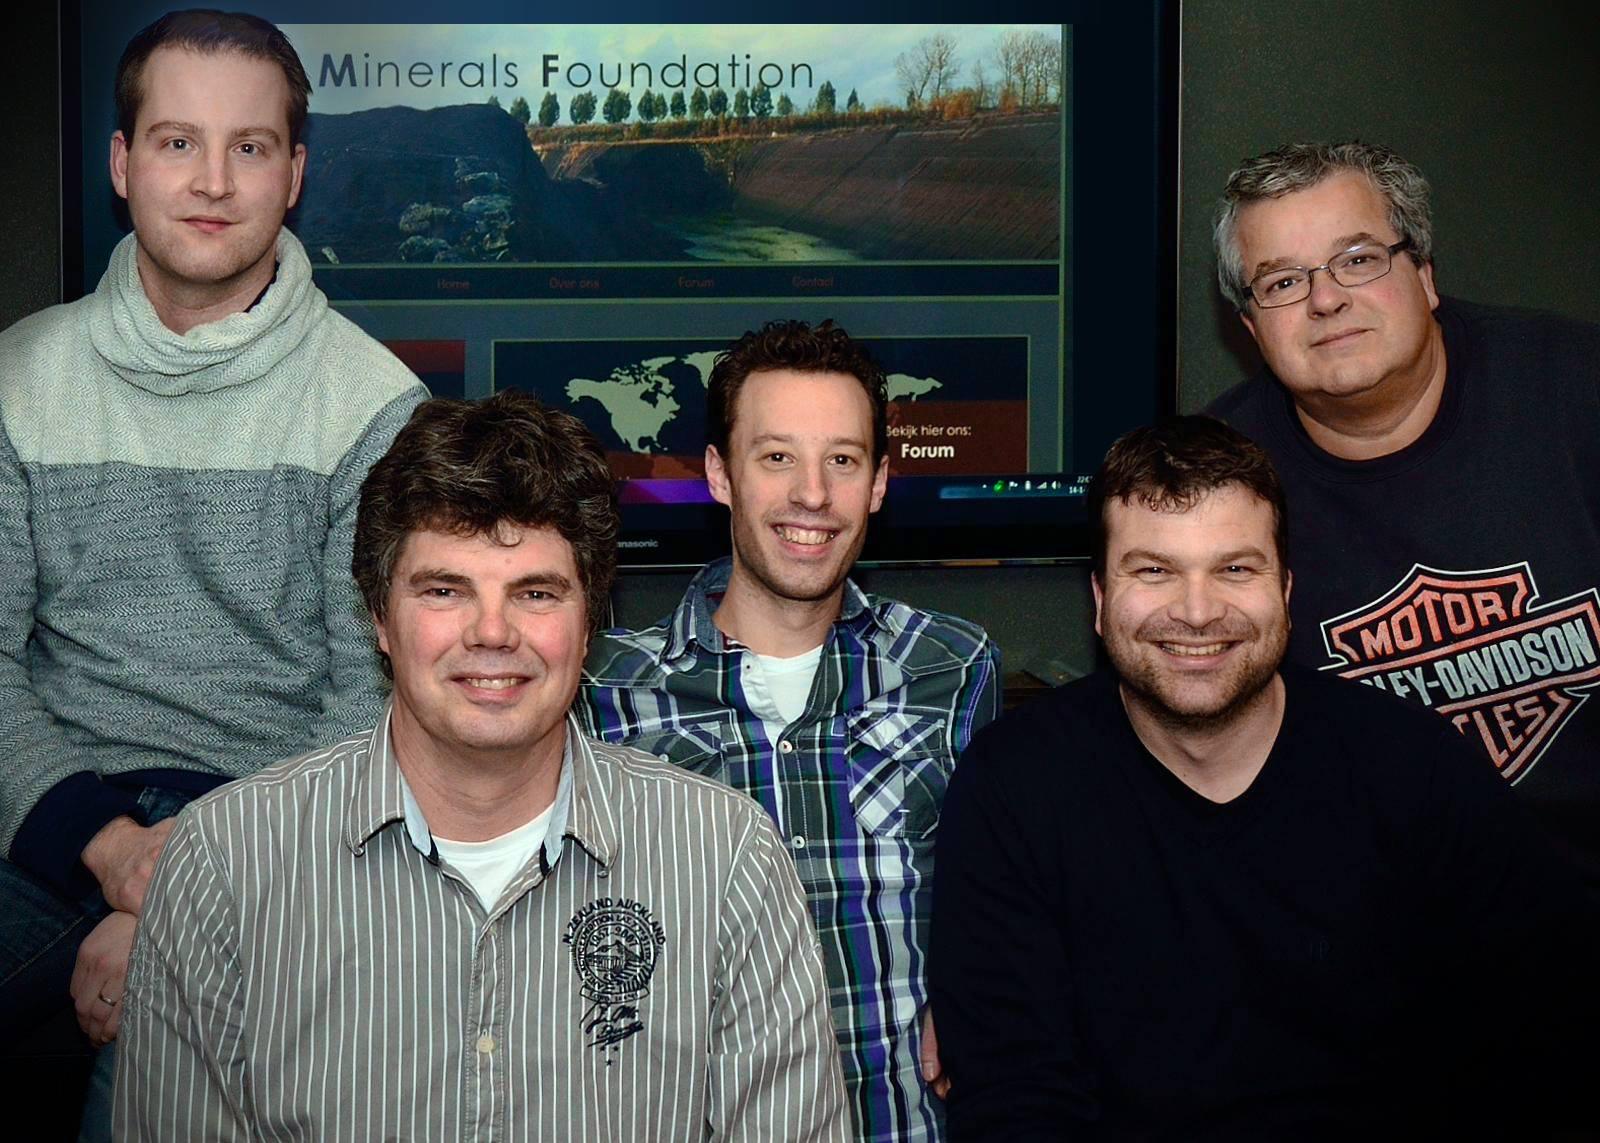 Vlnr: Daniël, Henrie, Kristian, Robert en Erwin